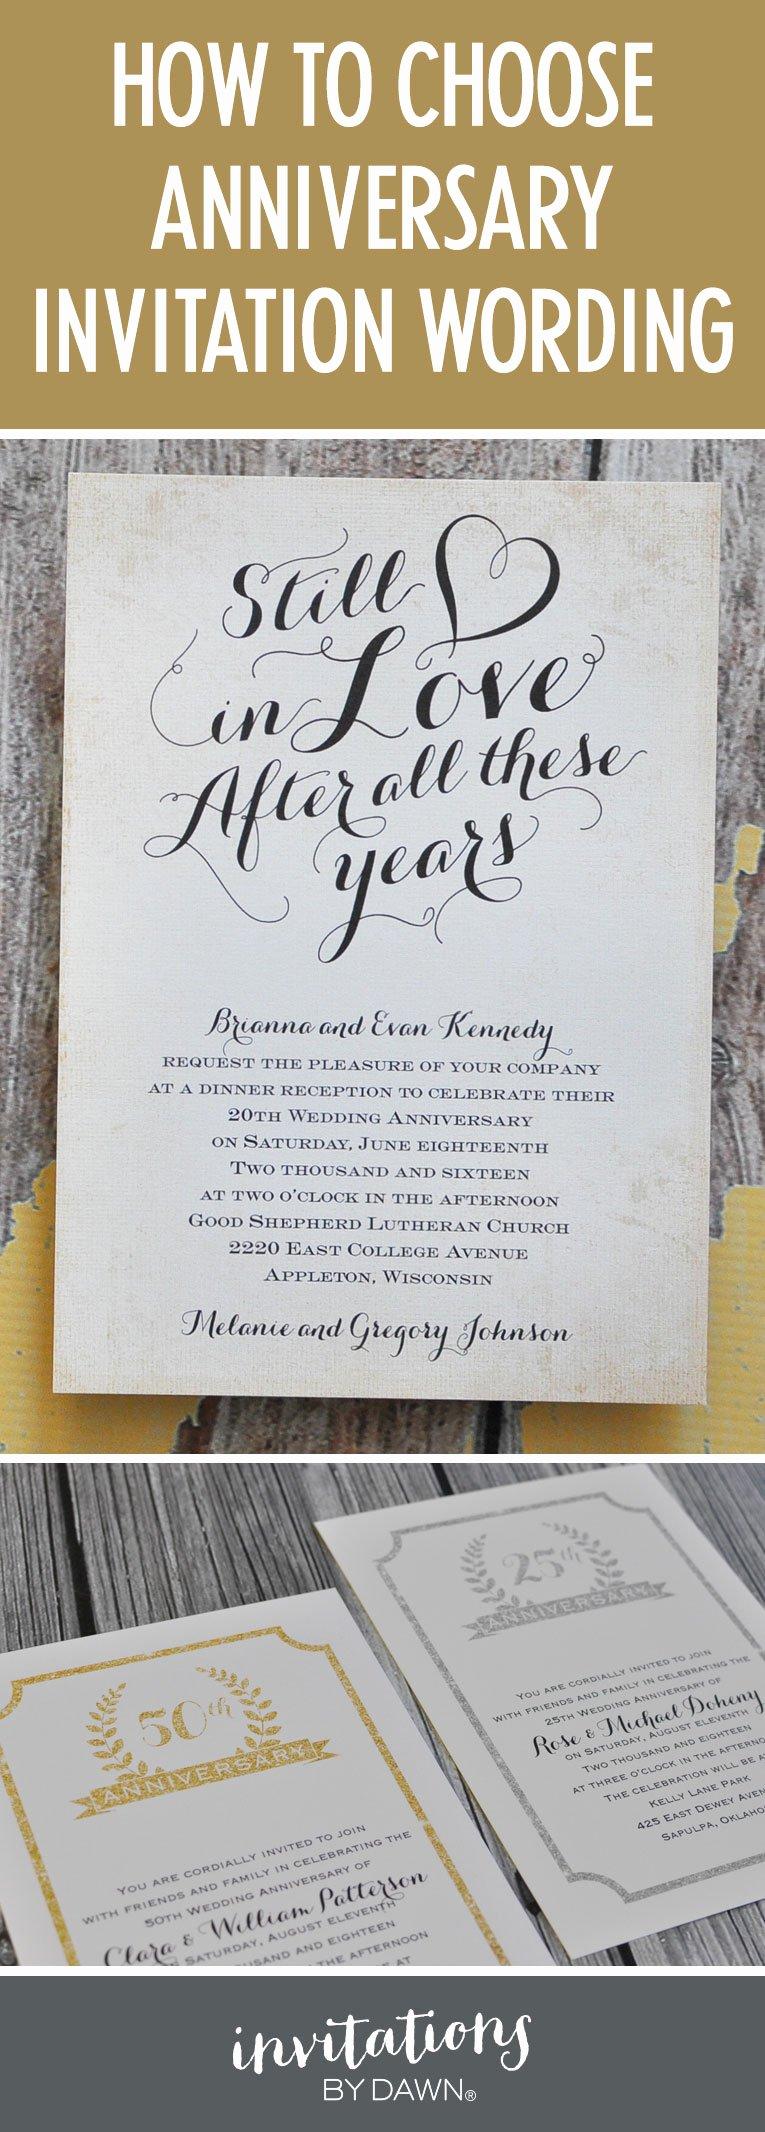 Wedding Anniversary Invitation Templates Best Of Finding the Right Wedding Anniversary Invitation Wording